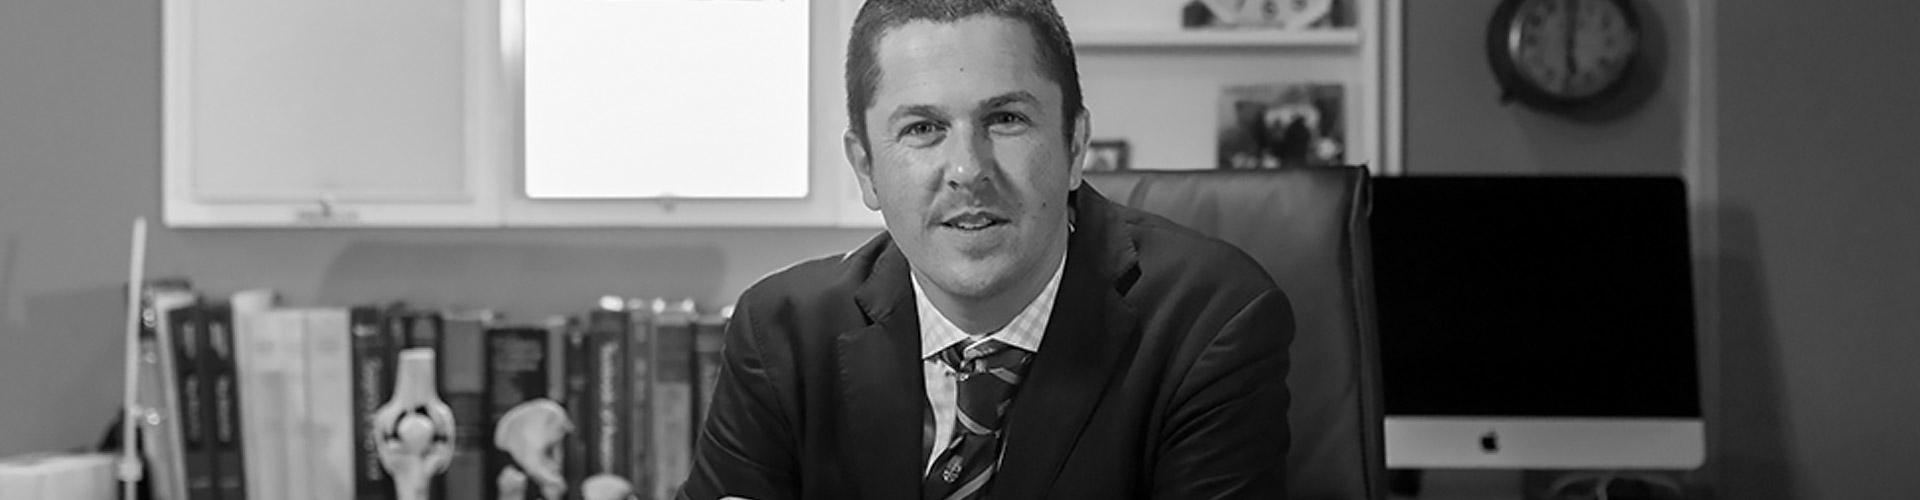 Dr Josh Hunt - Hand Surgeon, Newcastle - Home Slider 2